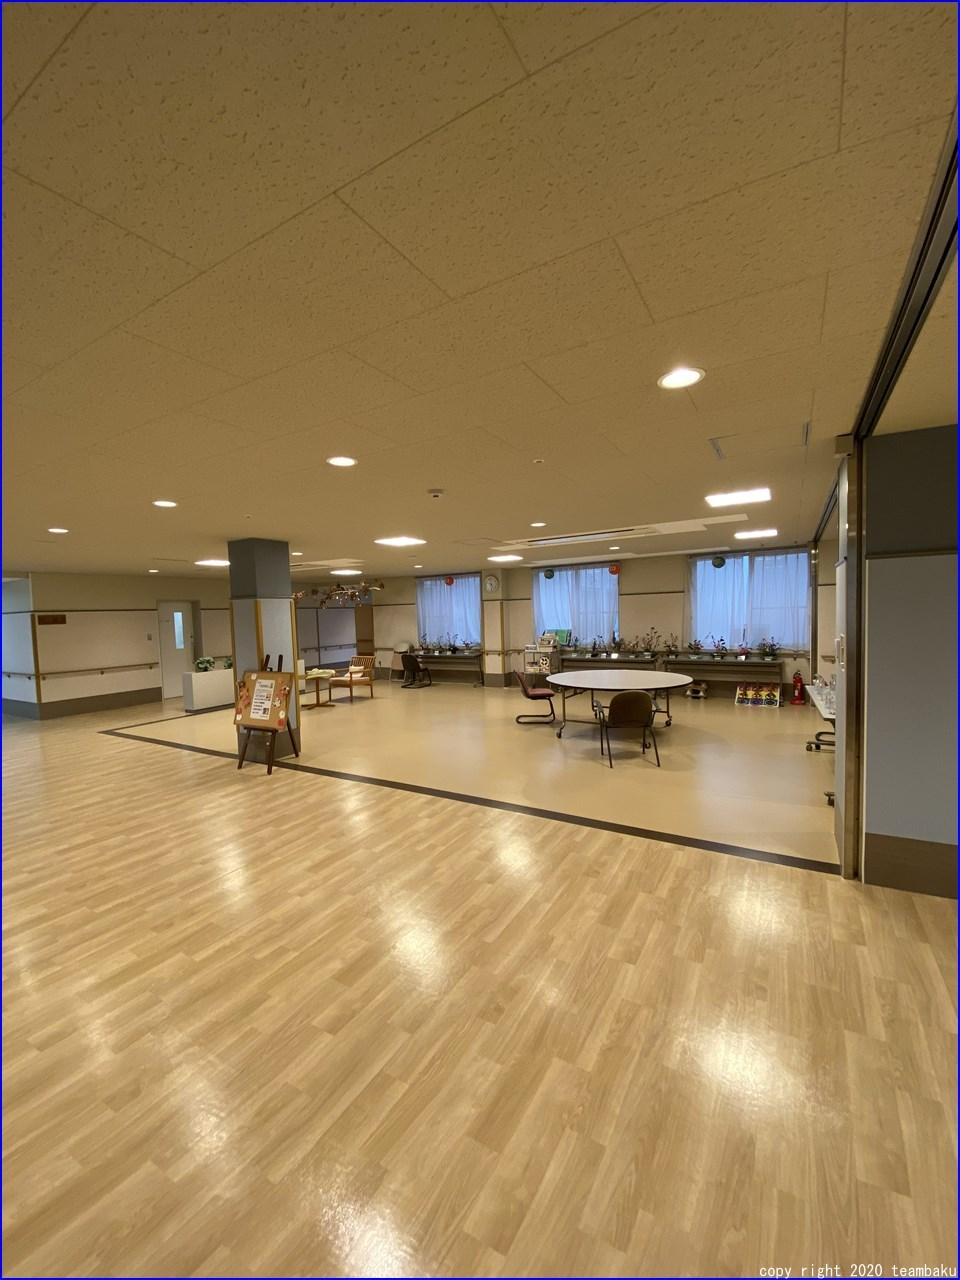 N病院グループ N病院東館 介護医療院 転換改修工事 4_c0376508_10425412.jpg